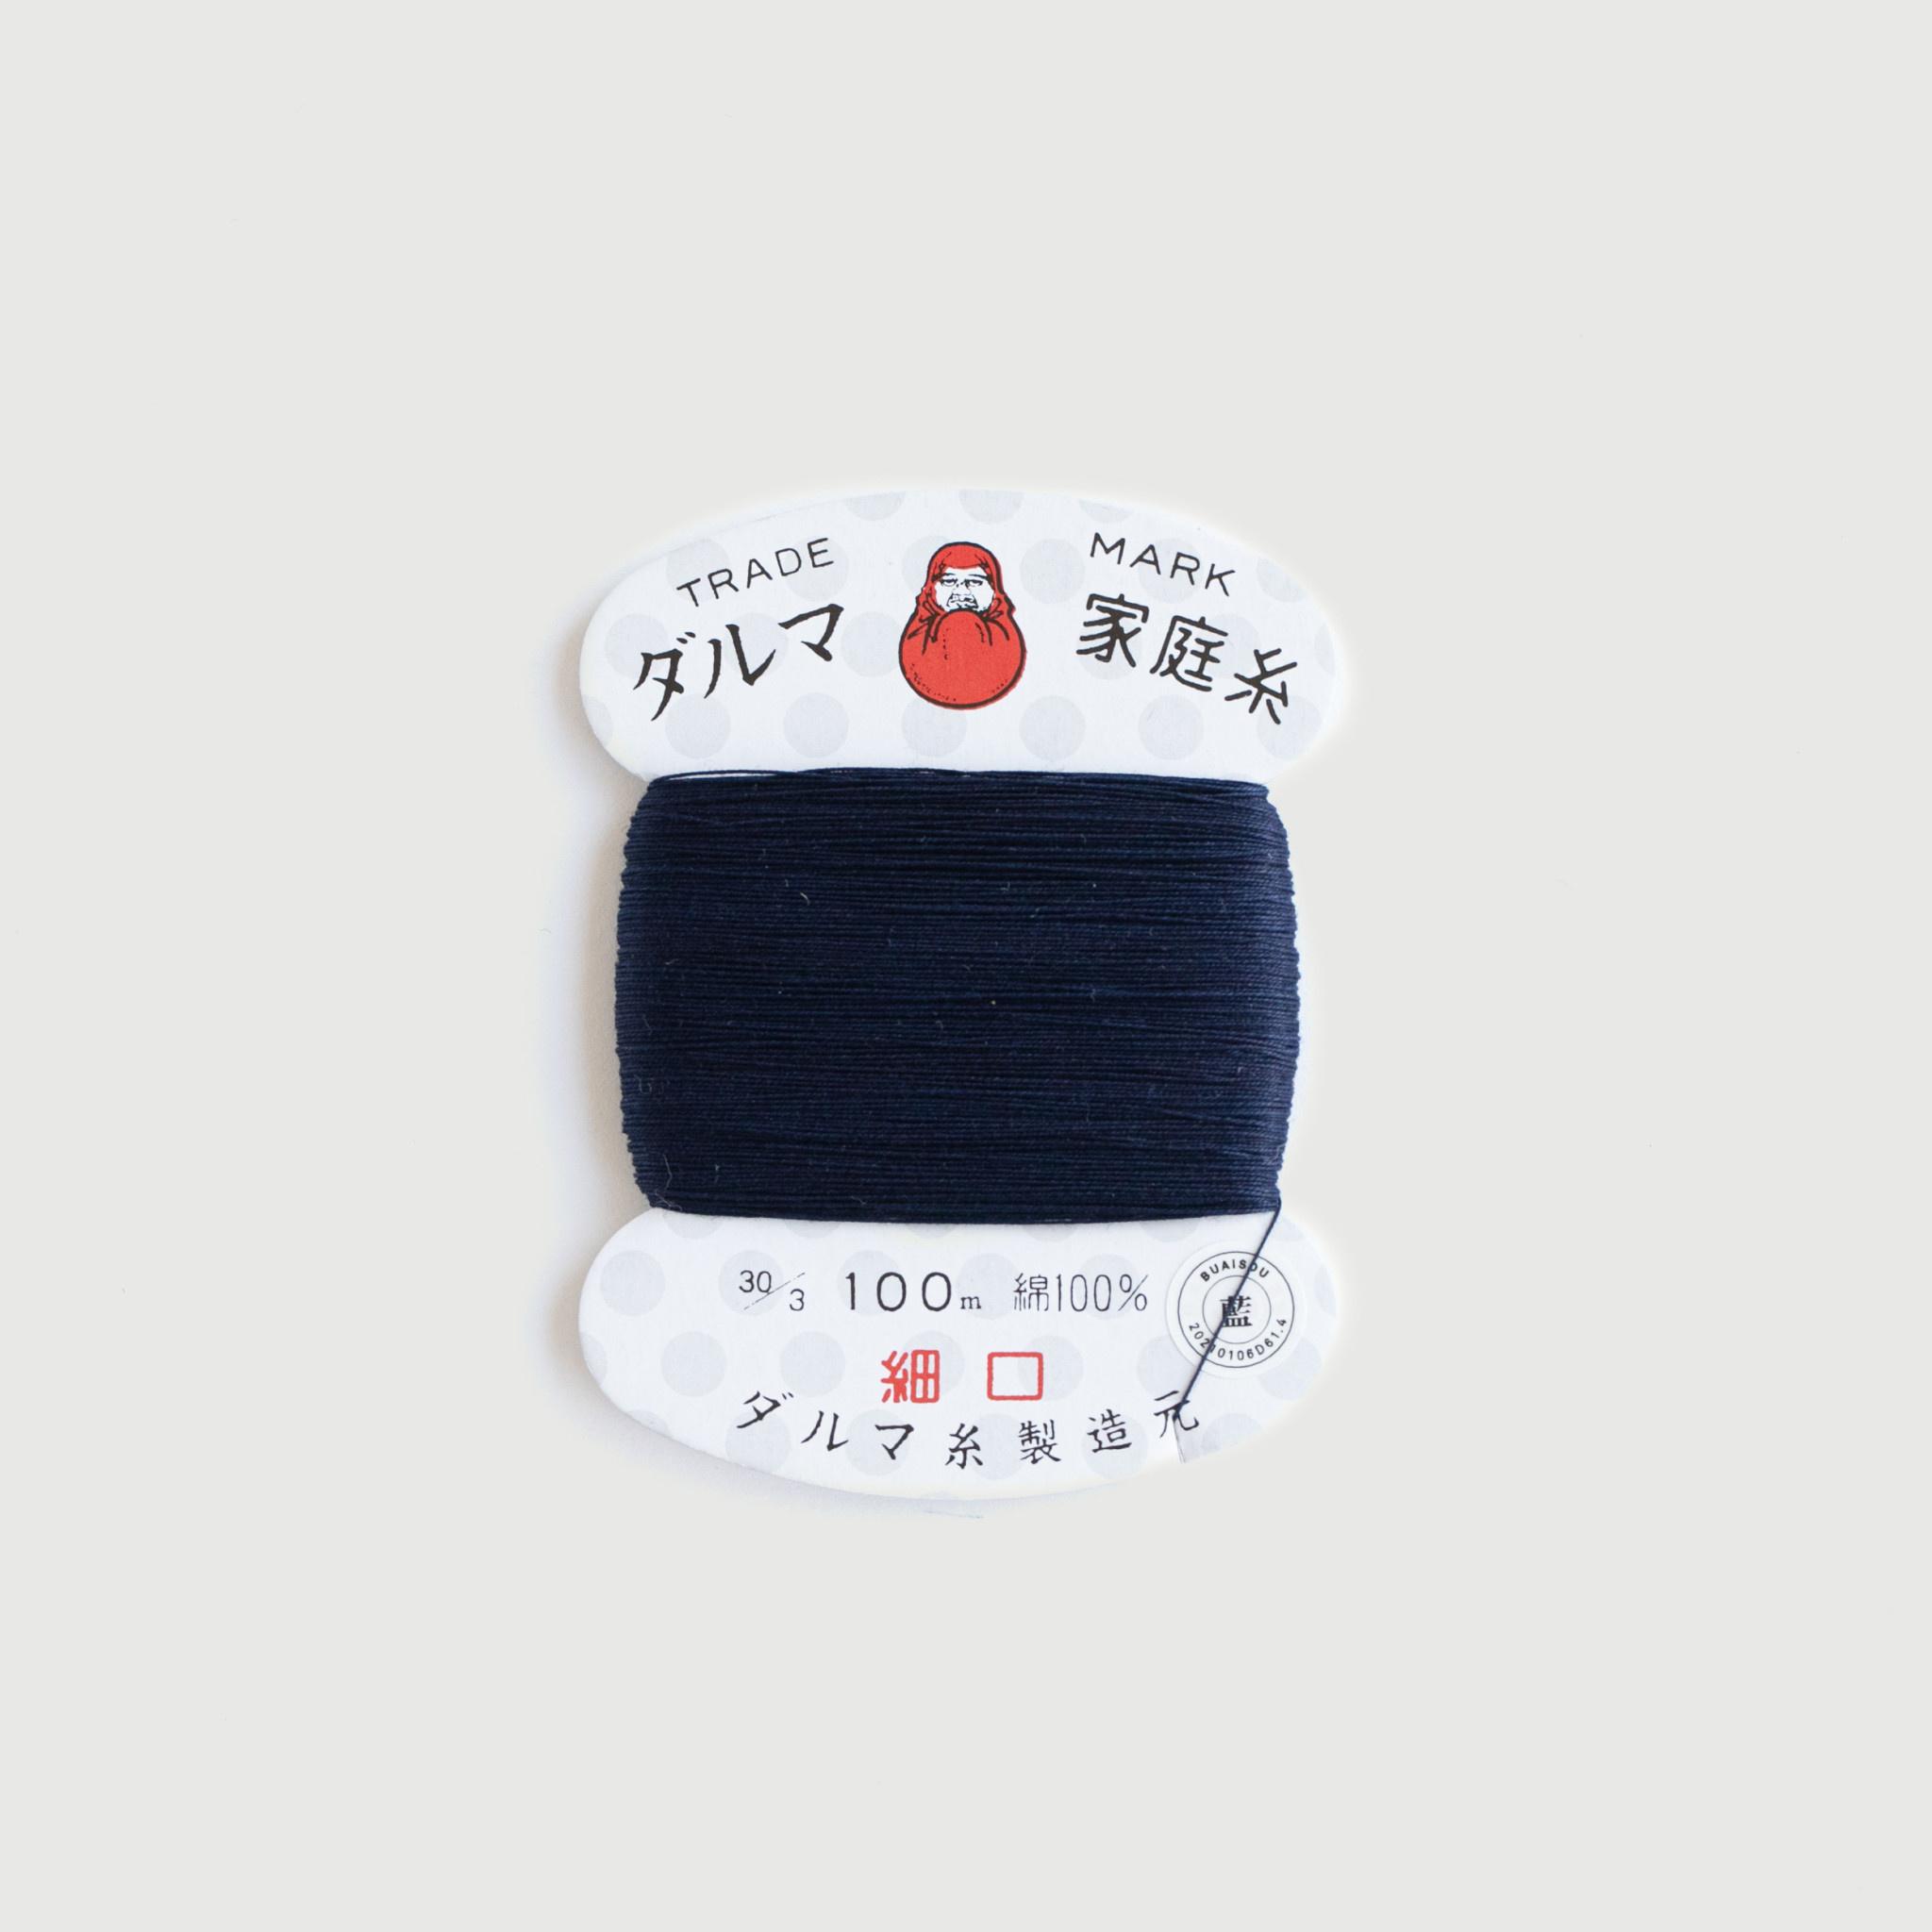 buaisou Buaisou Indigo Dyed Daruma-Ito Home Thread #30 (Thin) for Hand Sewing 100% Cotton 100m